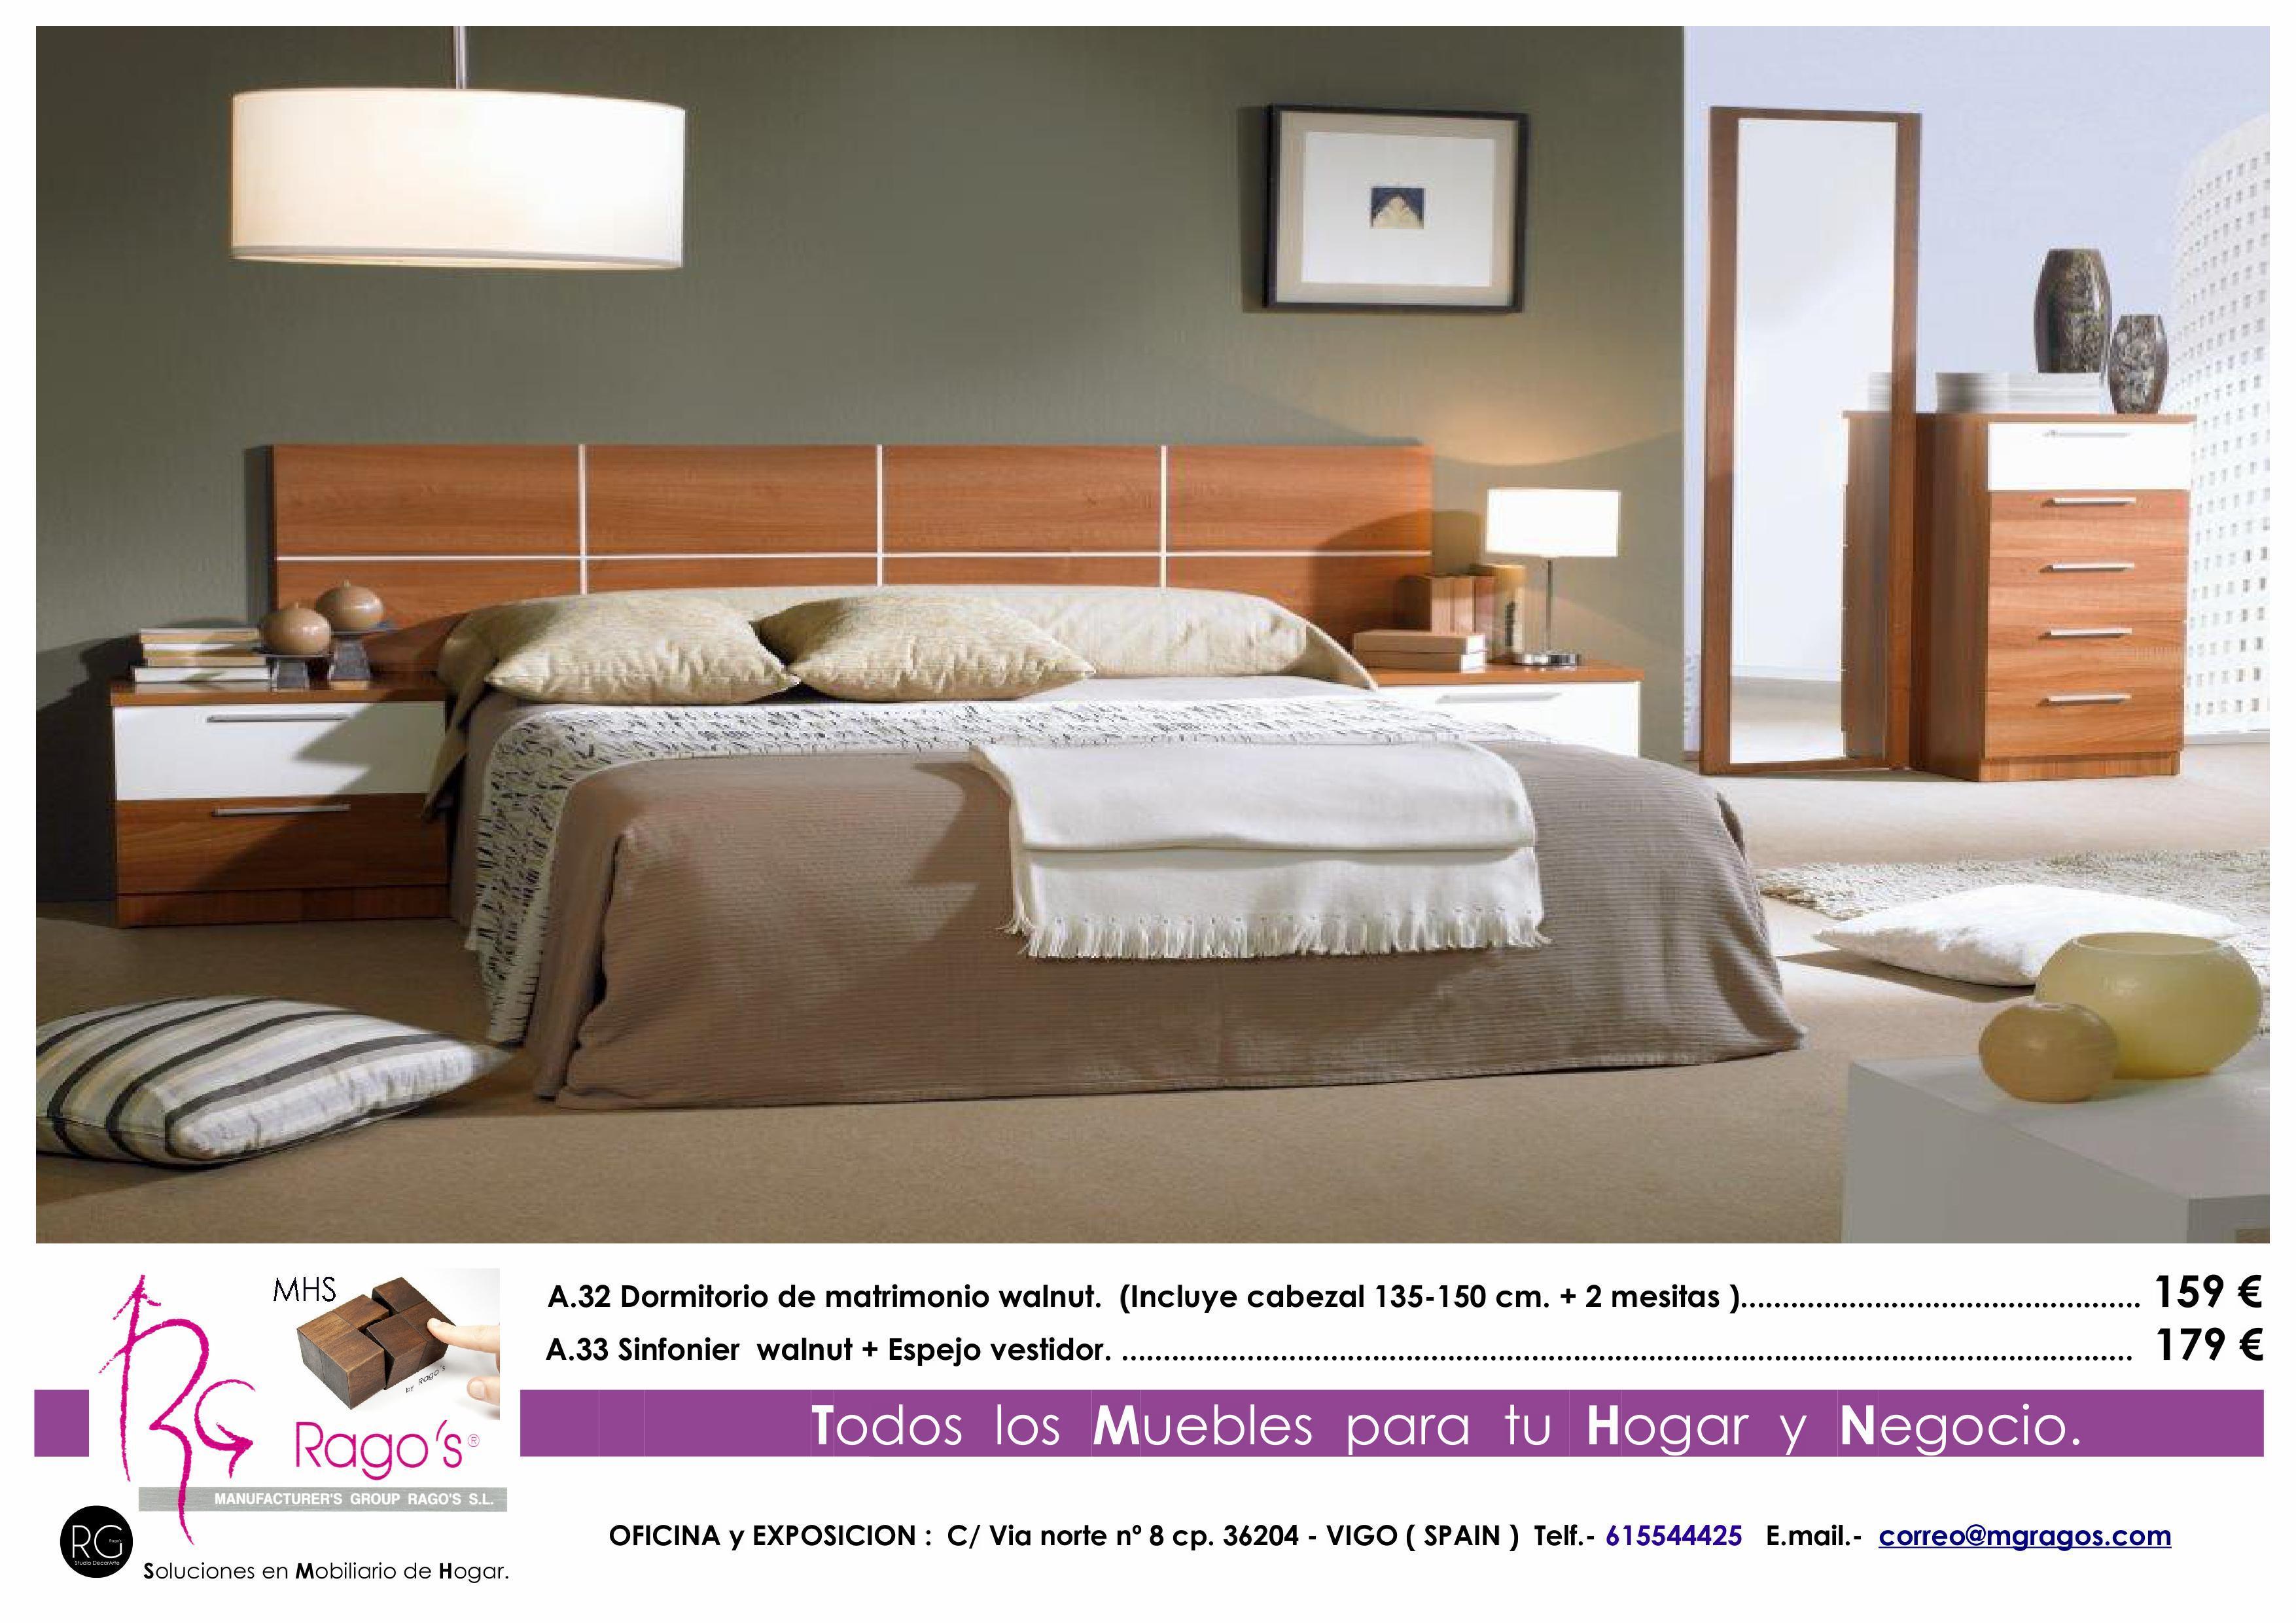 A.32-A.33 Dormitorio (Cabezal+Mesitas-Sinfonier+Espejo) Pag. nº 4